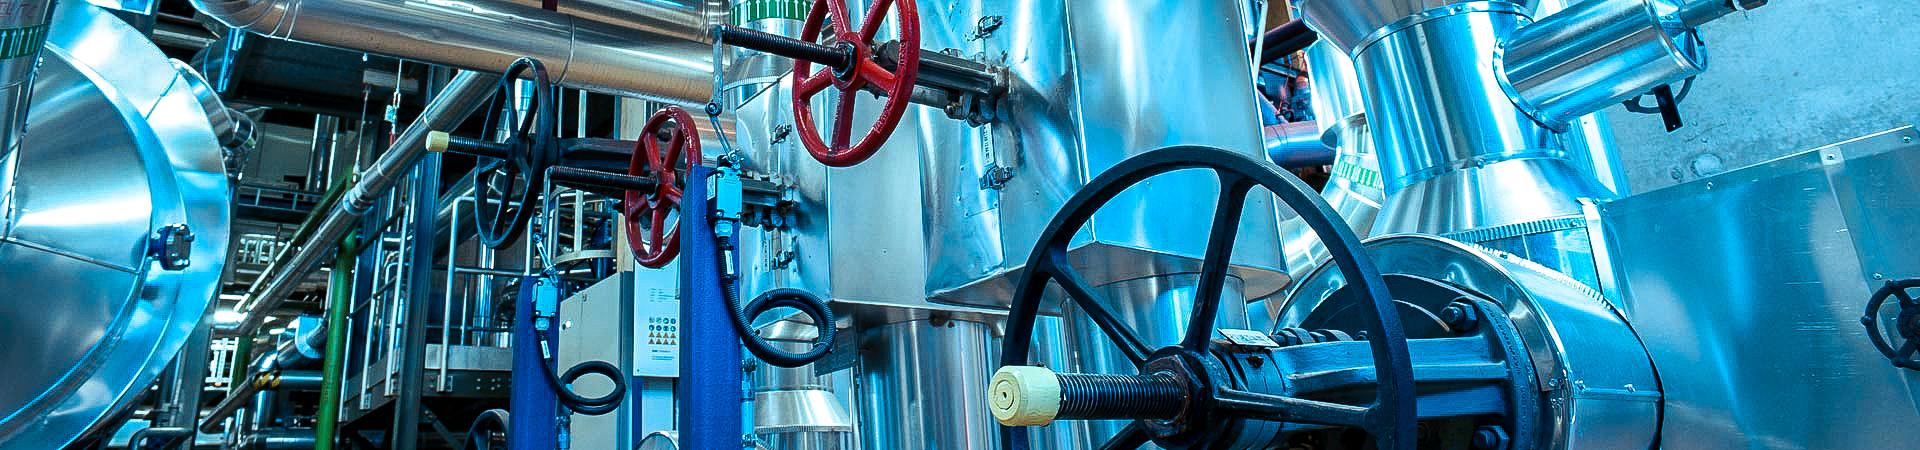 Links Industriekletterer IBE Industrieservice